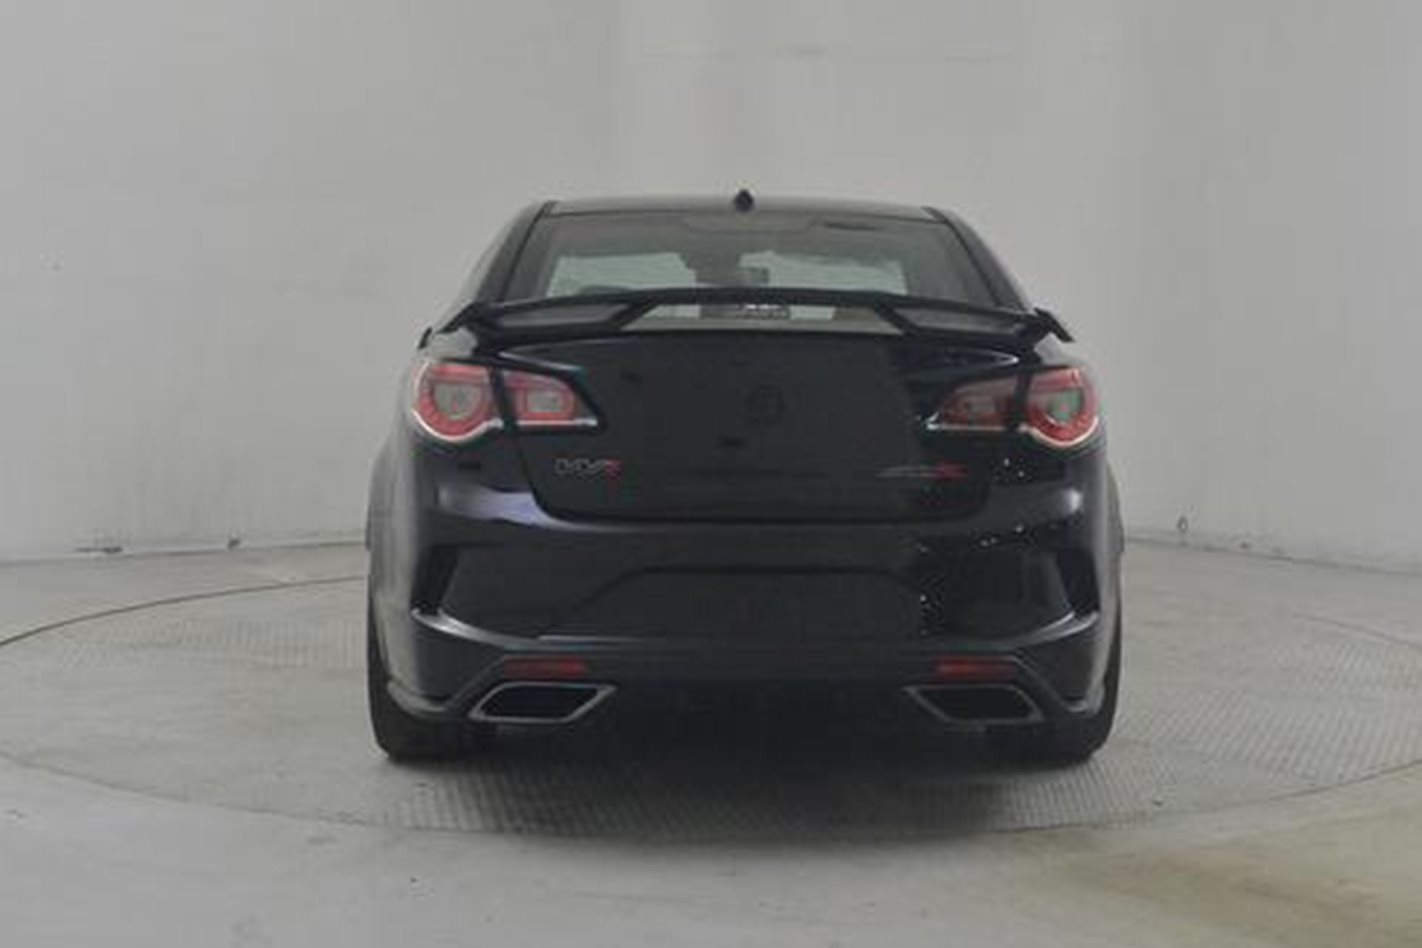 2017 HSV GTSR W1 rear